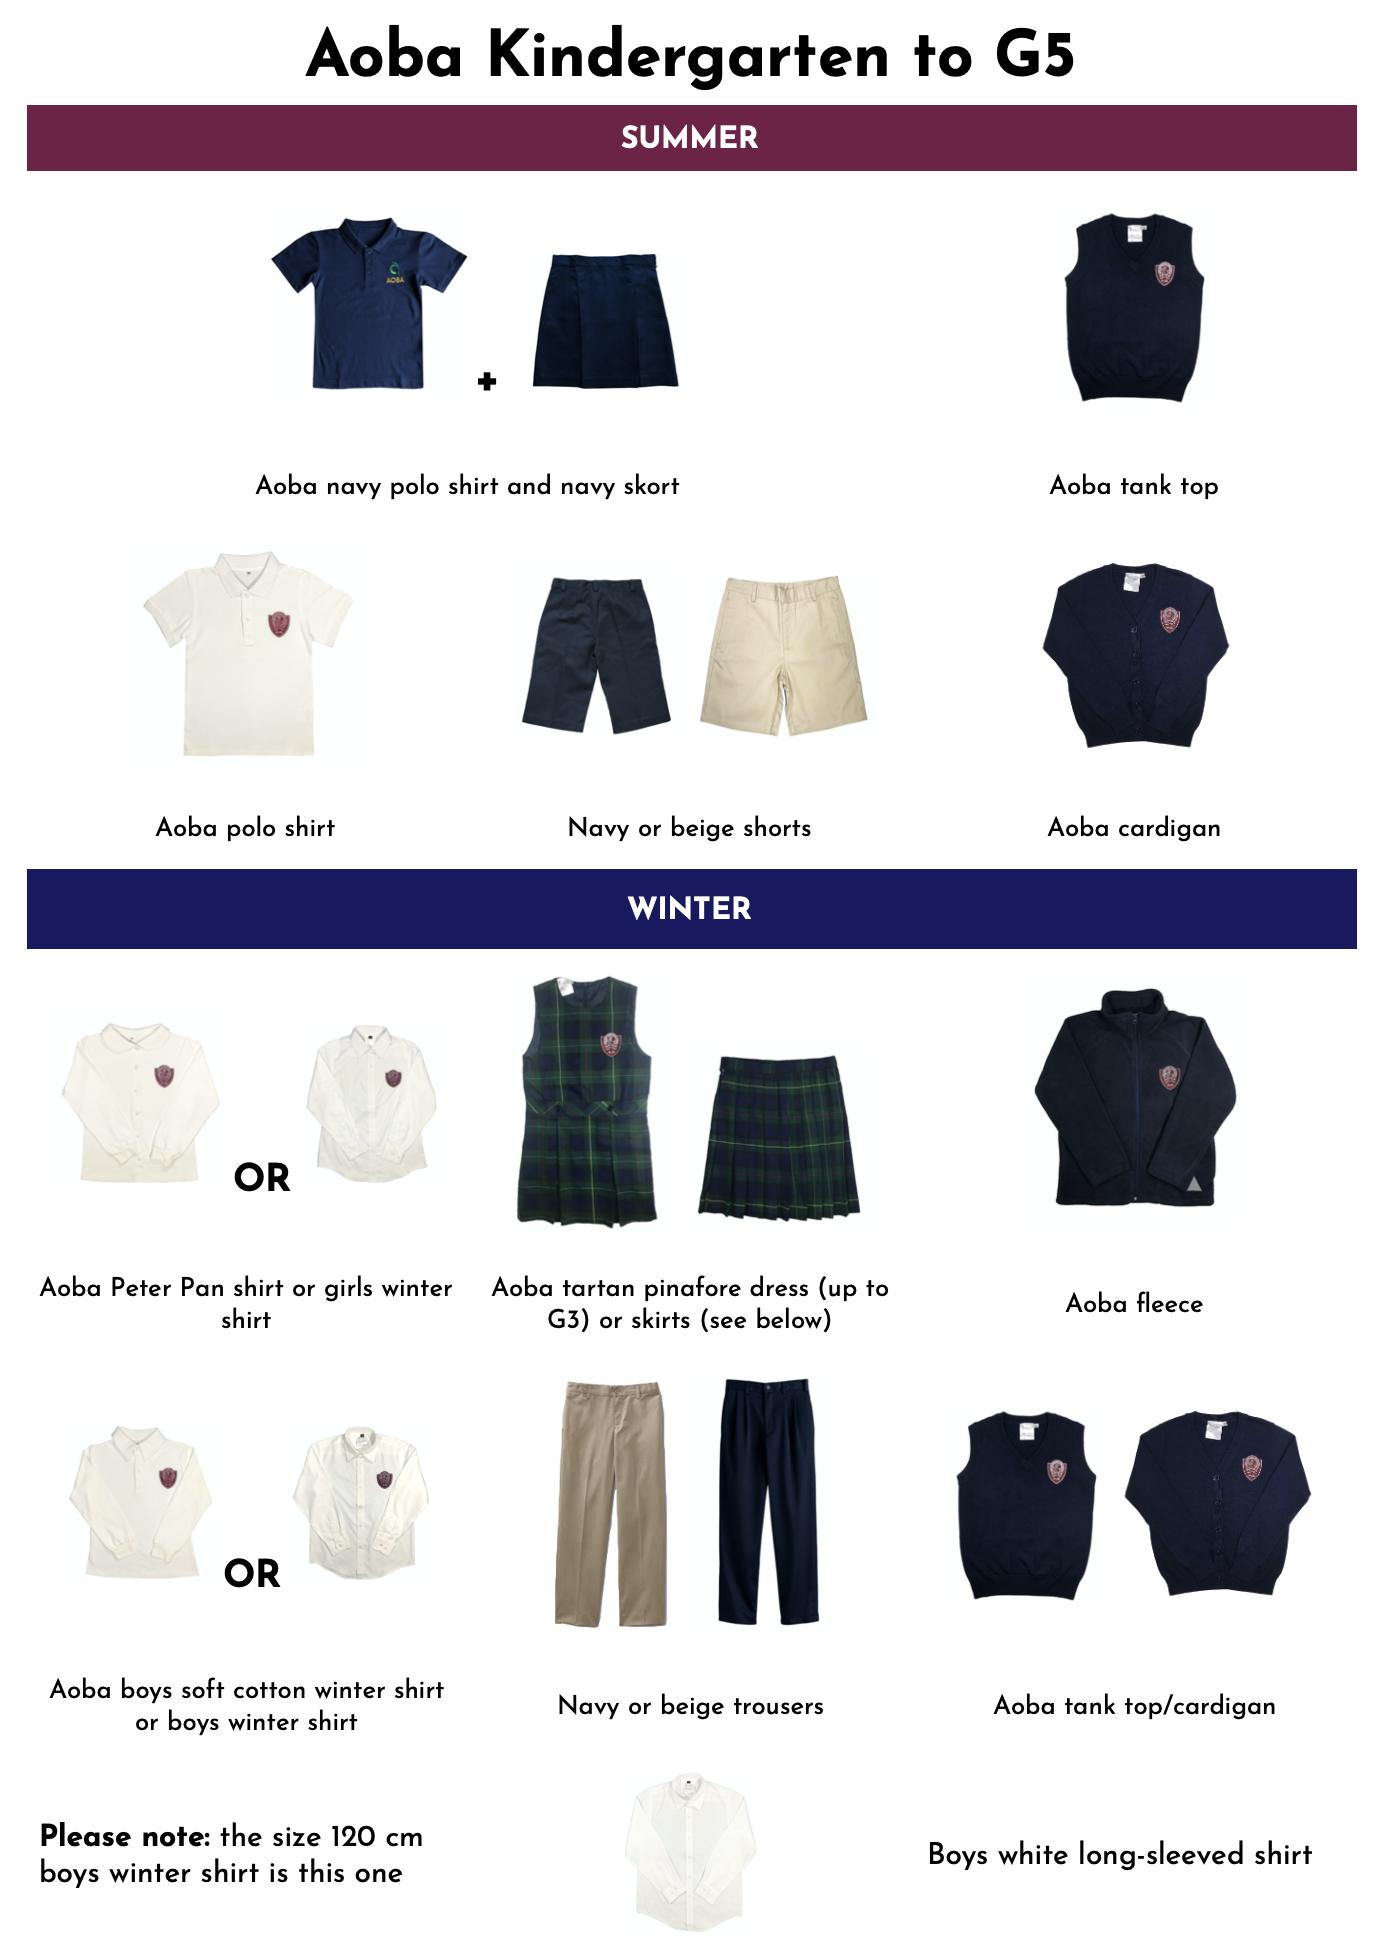 aoba-uniform-guide-2021-8.png